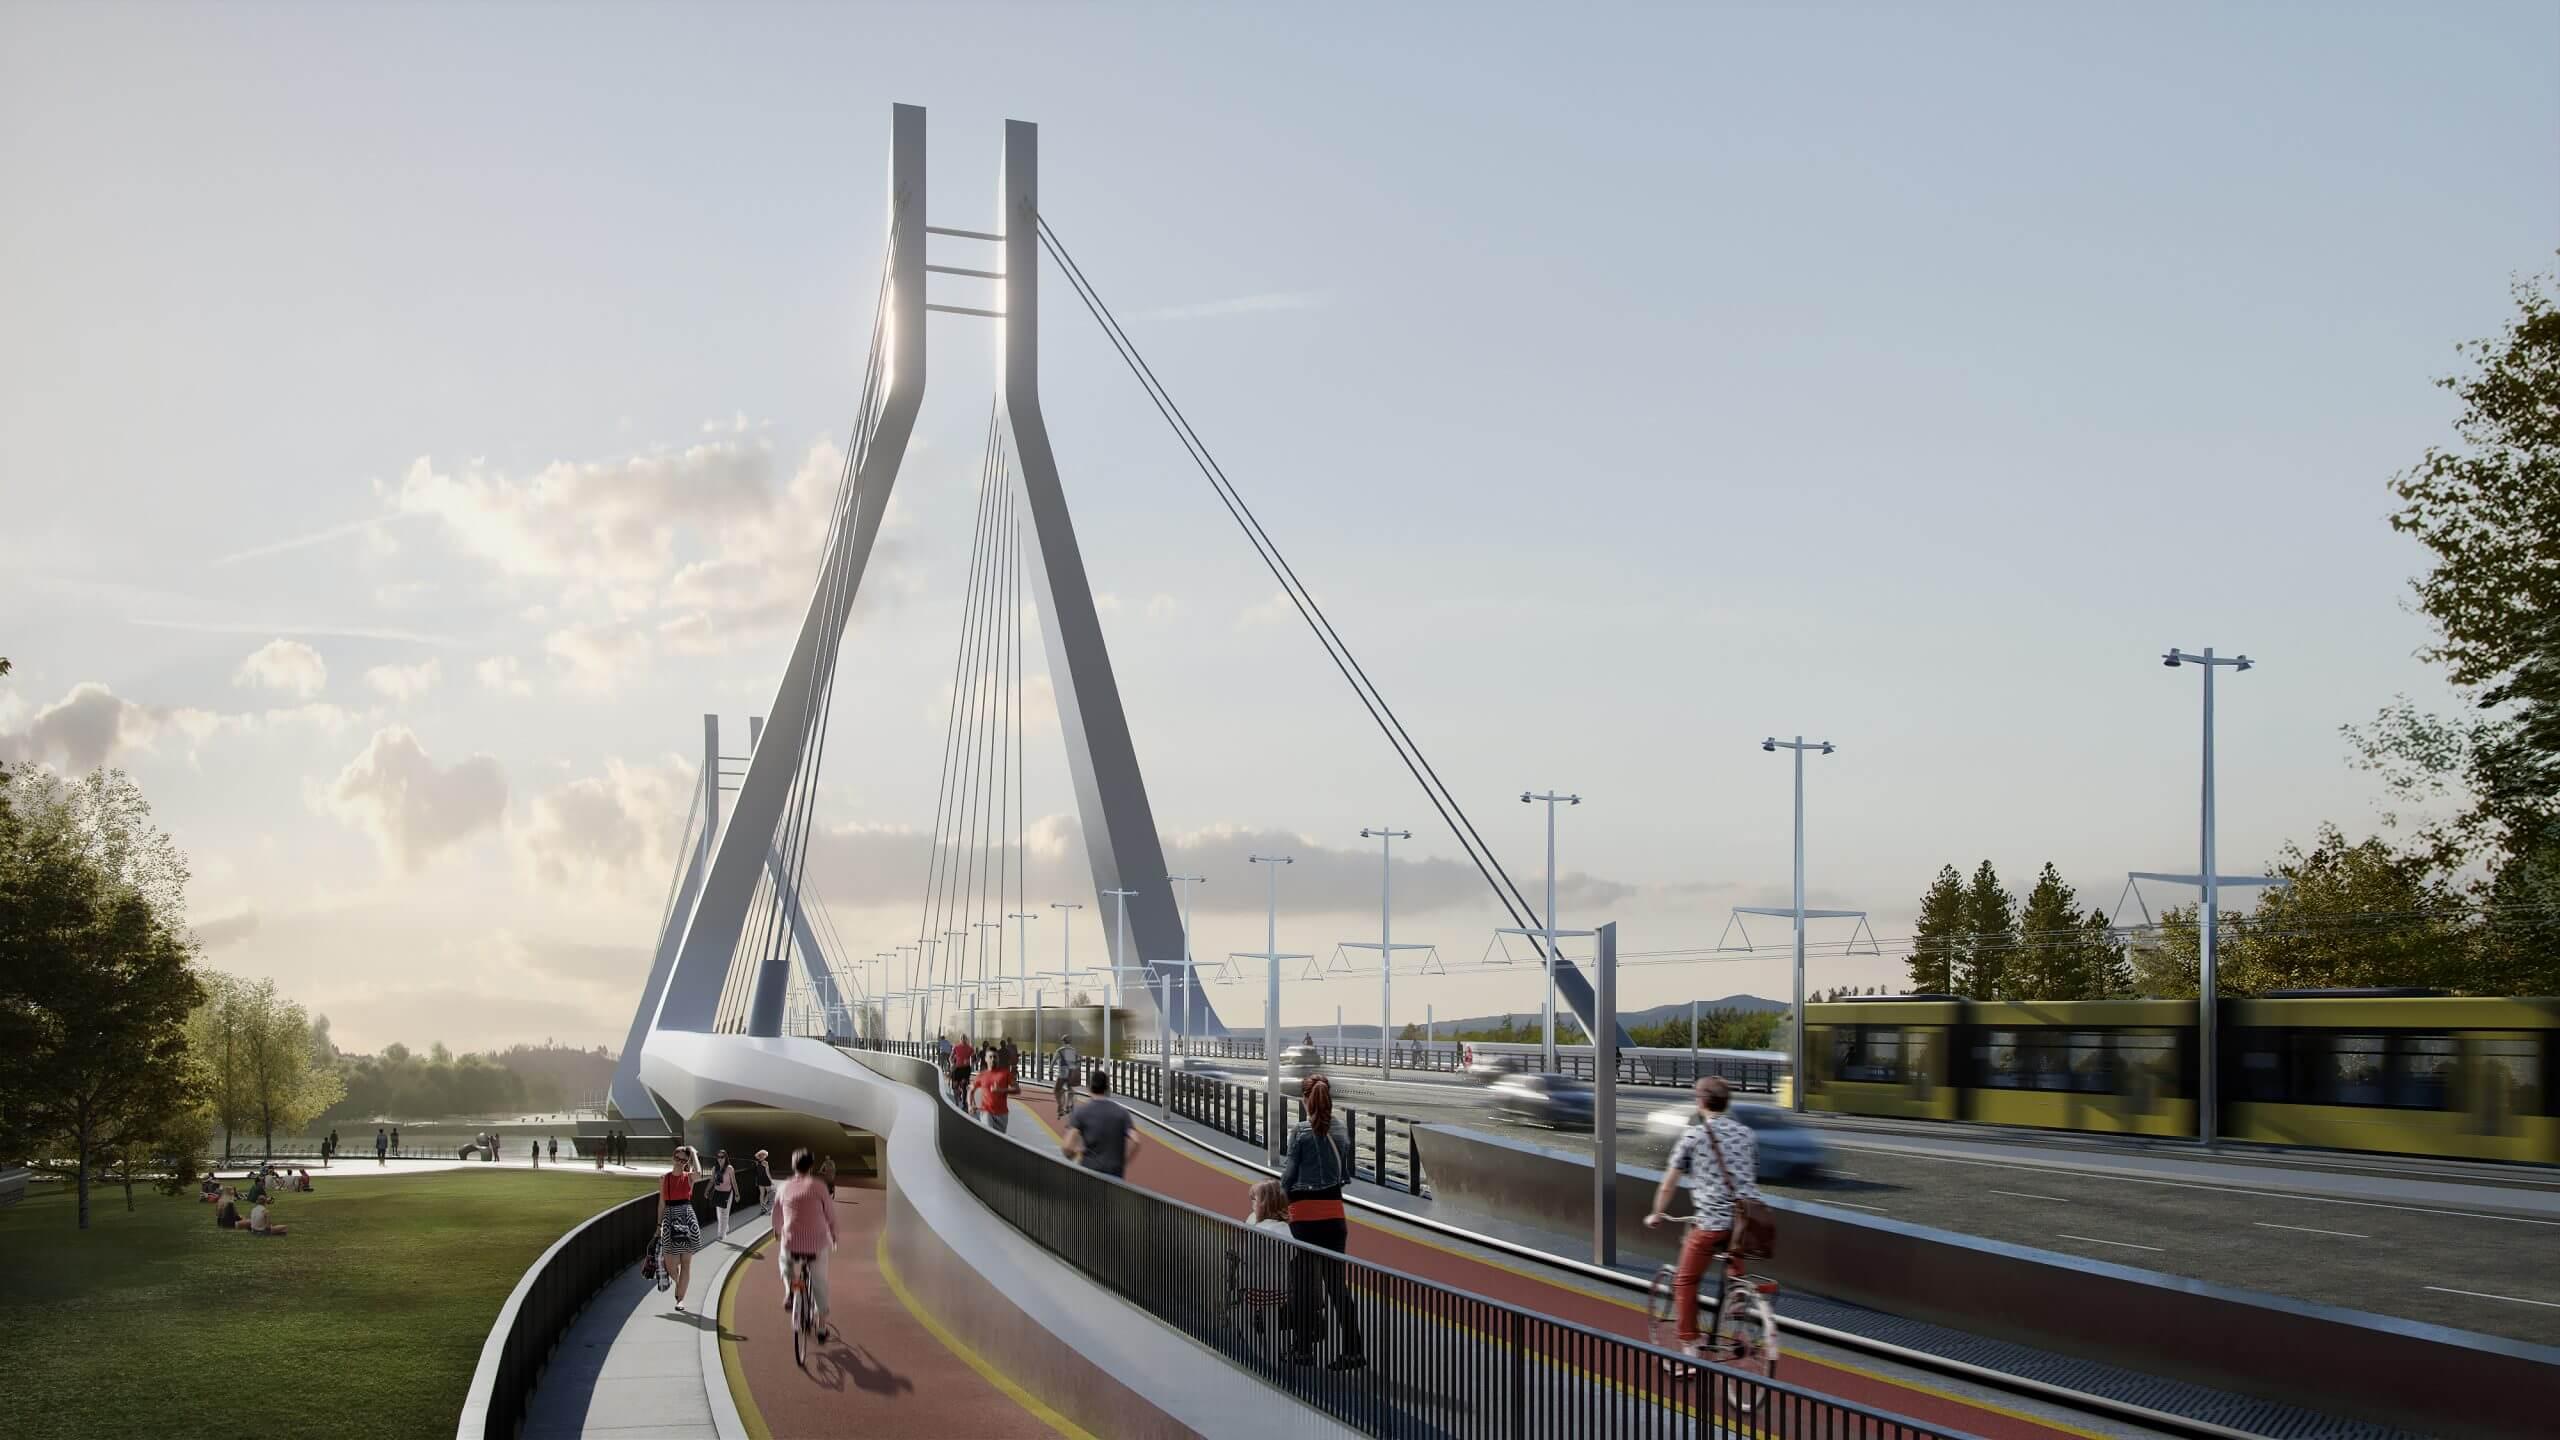 BFK: indul a villamosvonal tervezése a majdani Galvani hídon